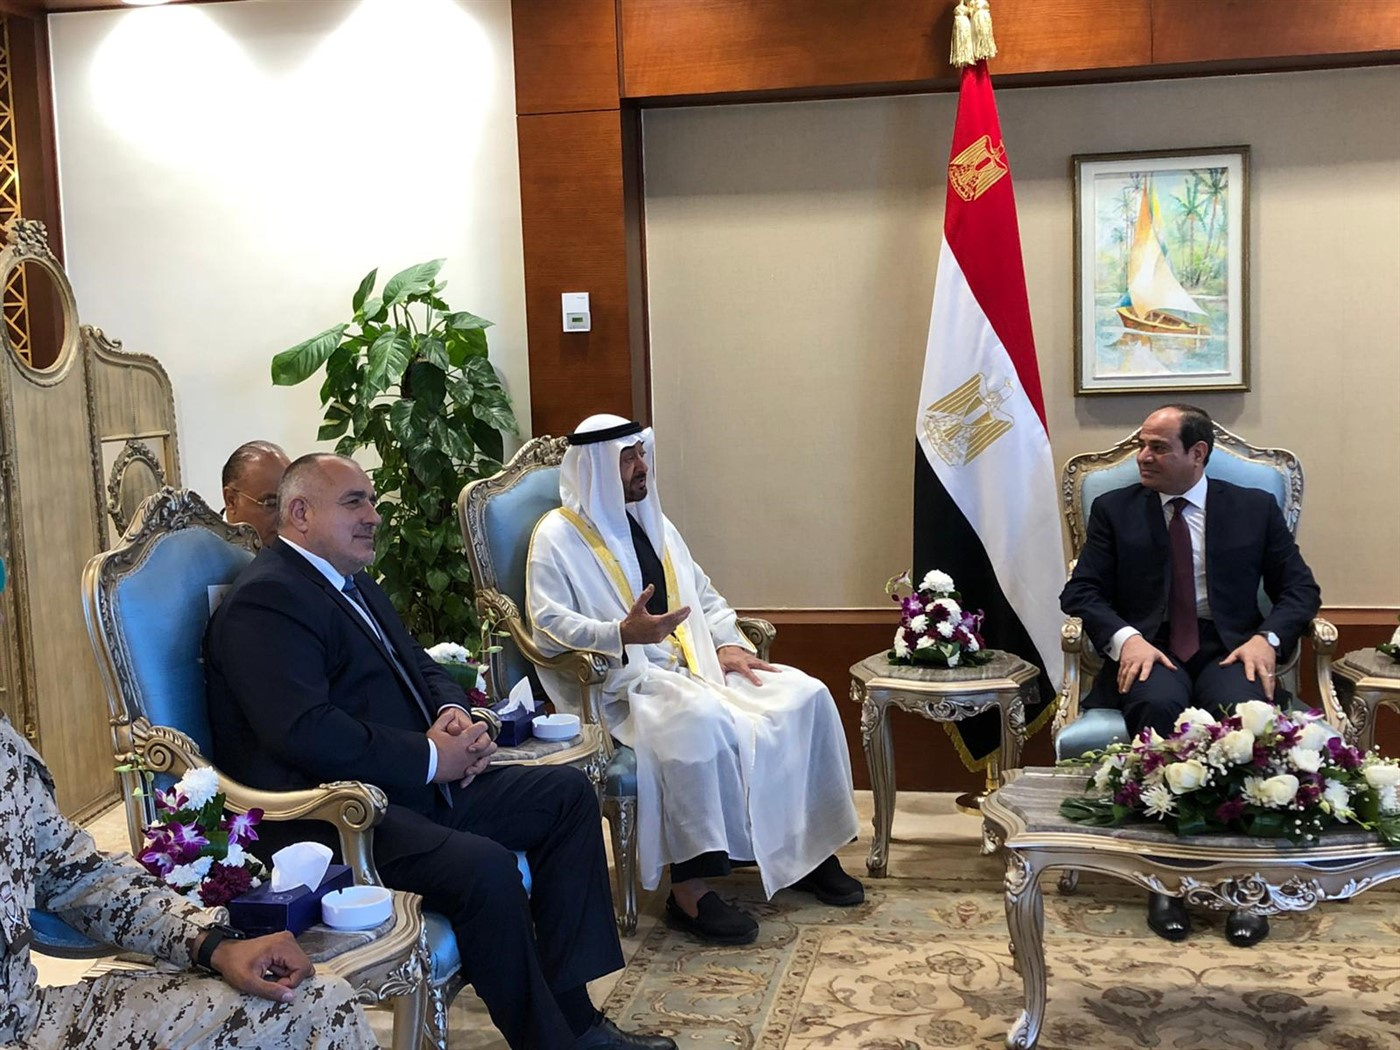 Borissov met with Sisi in Cairo